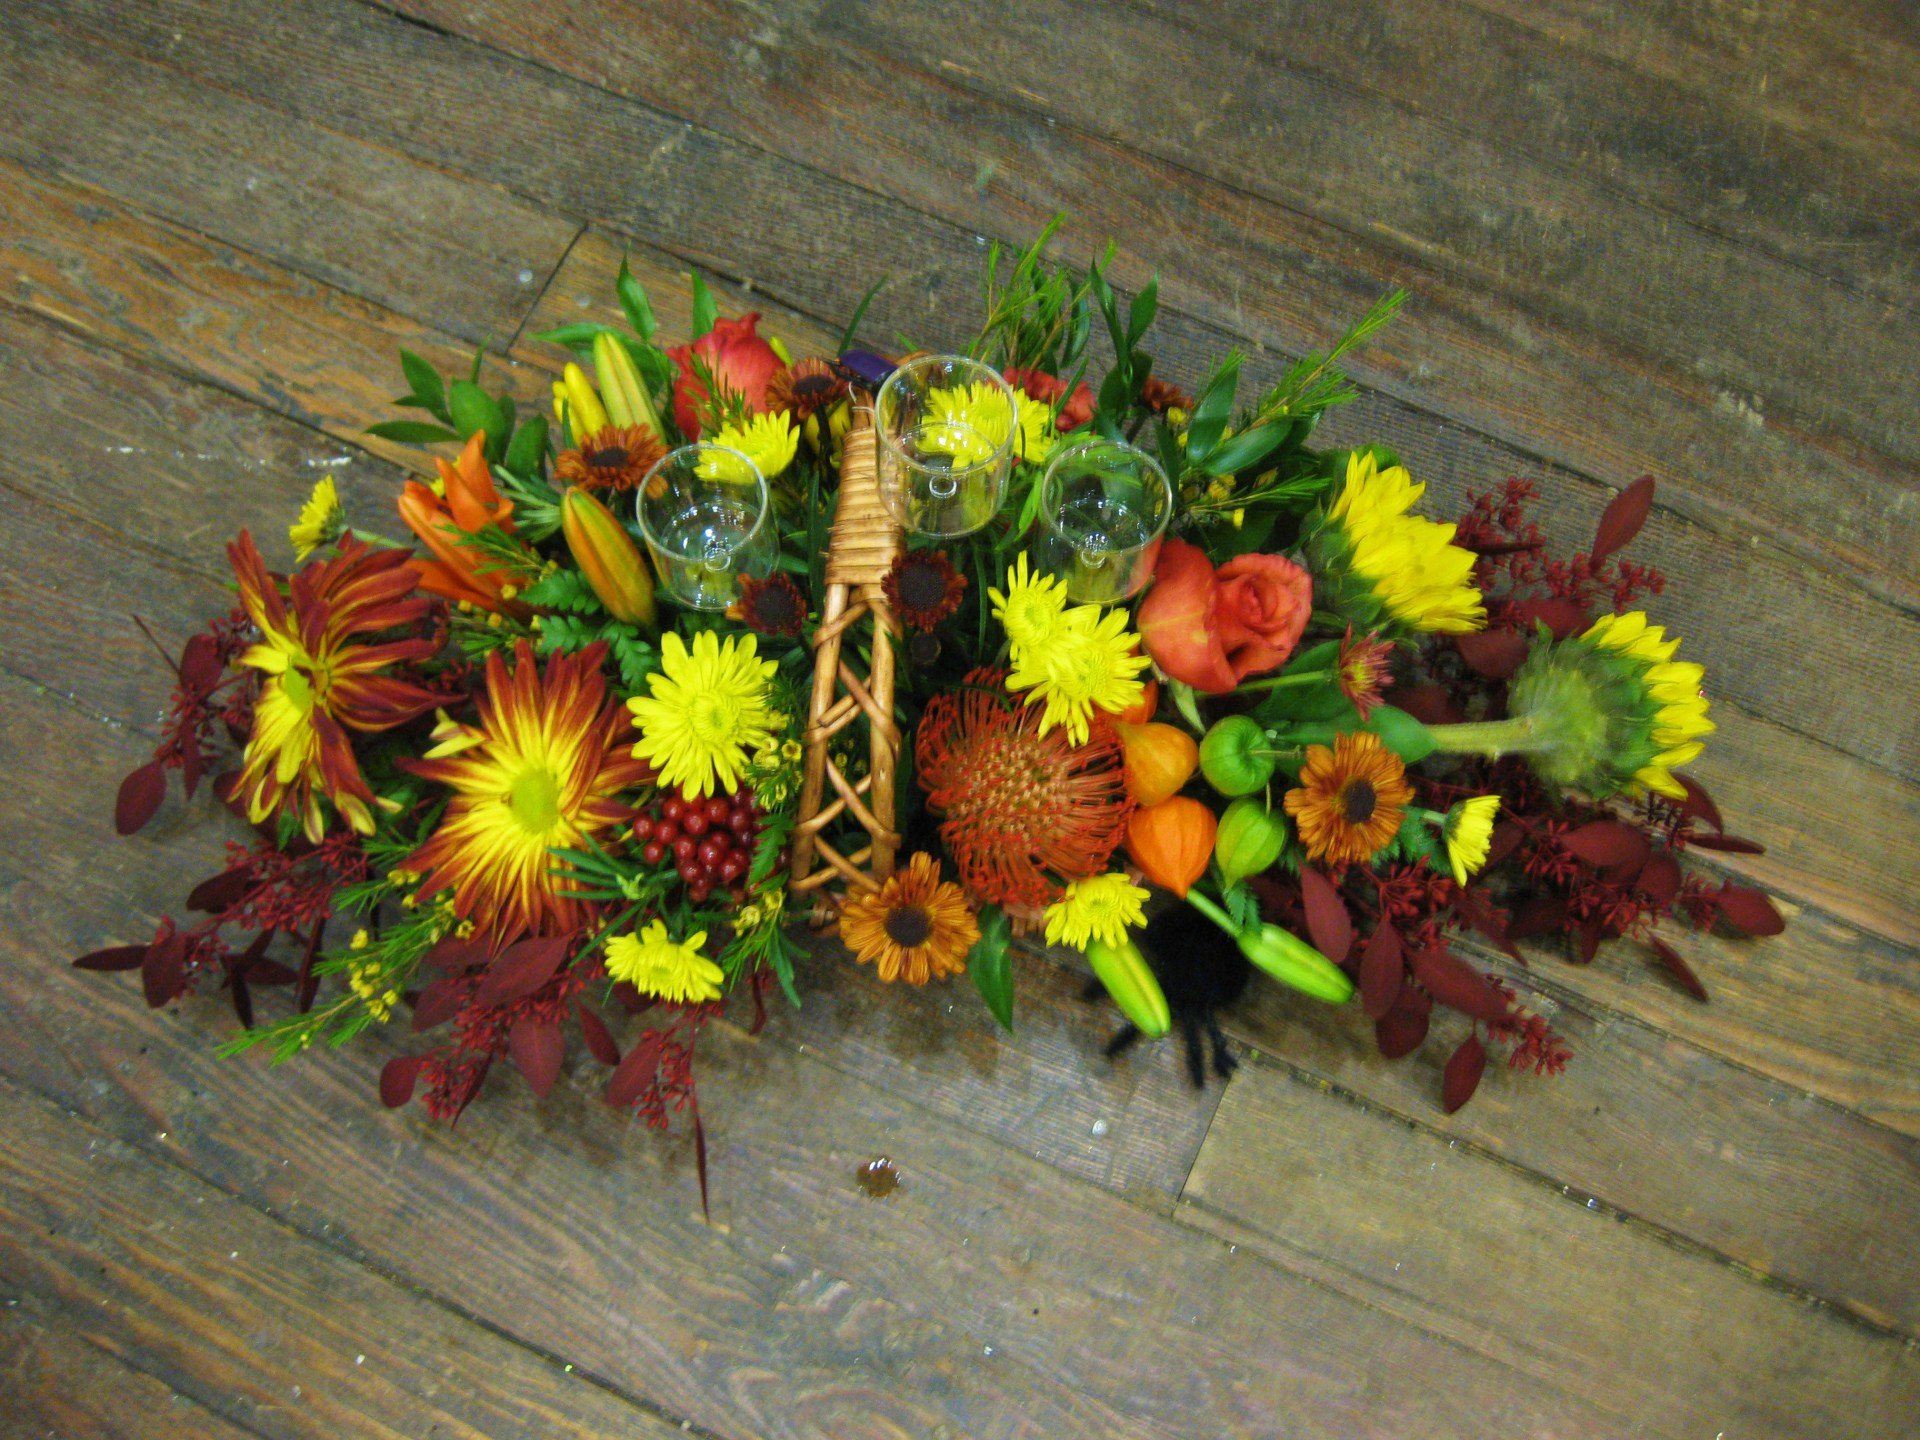 thanksgiving, holiday, fall, harvest